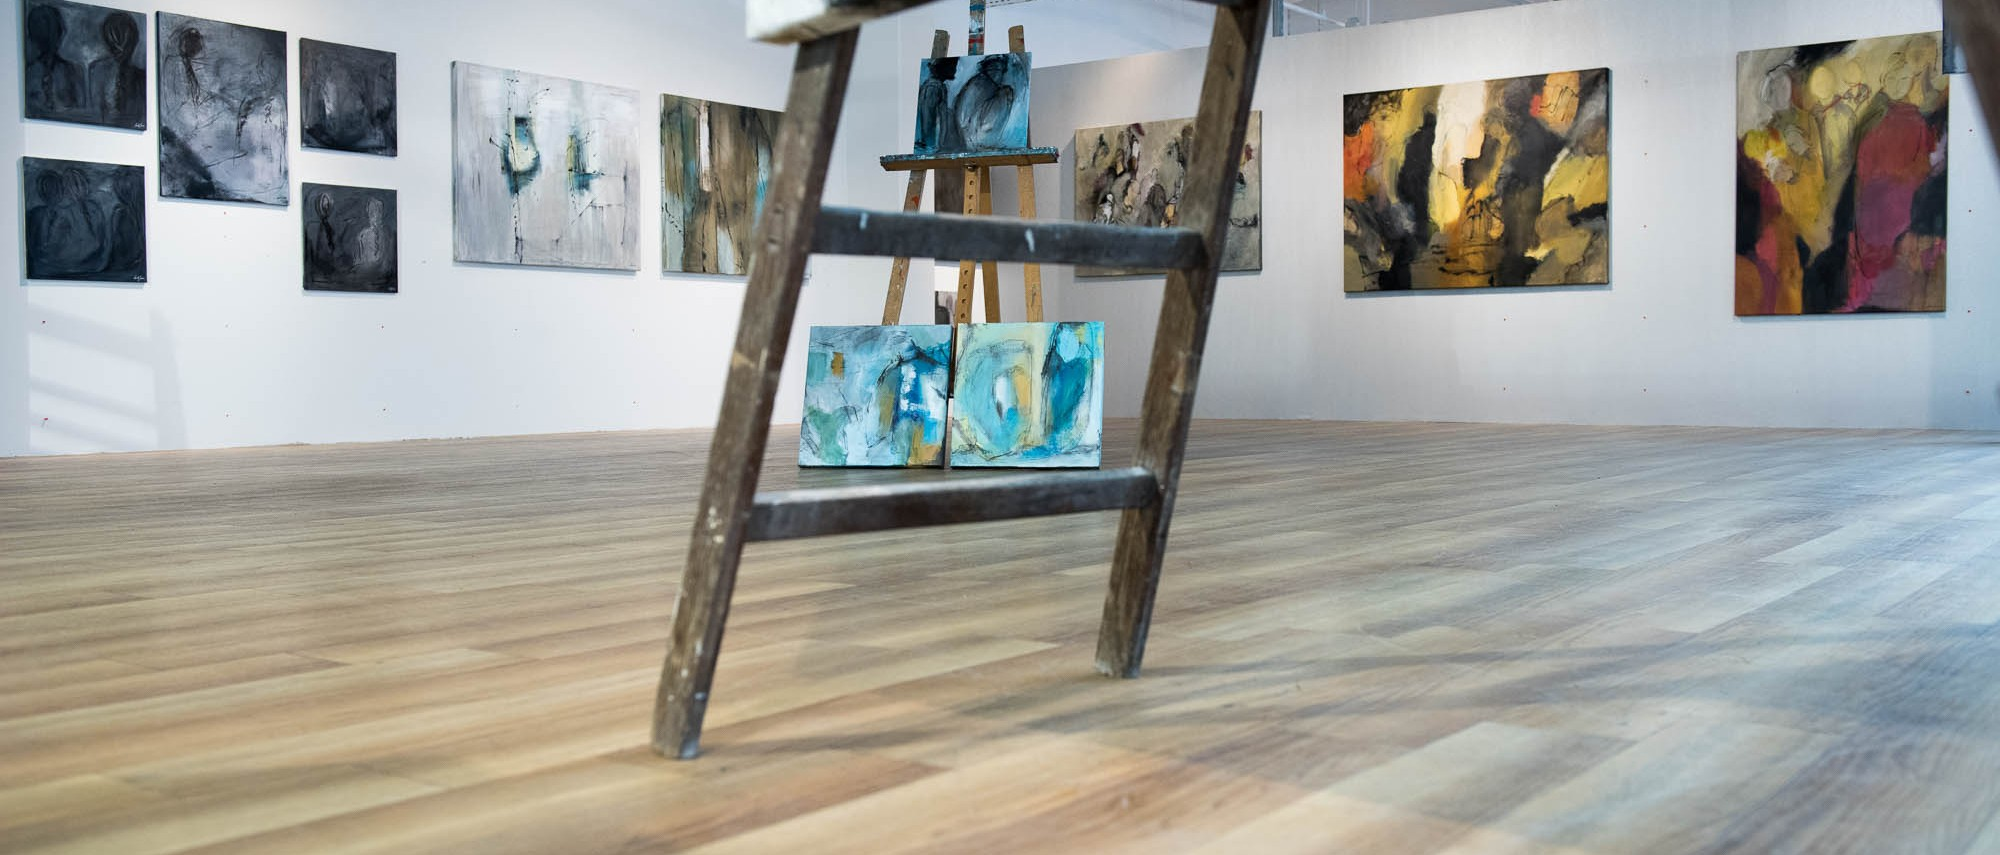 Stor udstilling af Anitta Jonas malerier, Galleri AJ i Holte Midtpunkt!